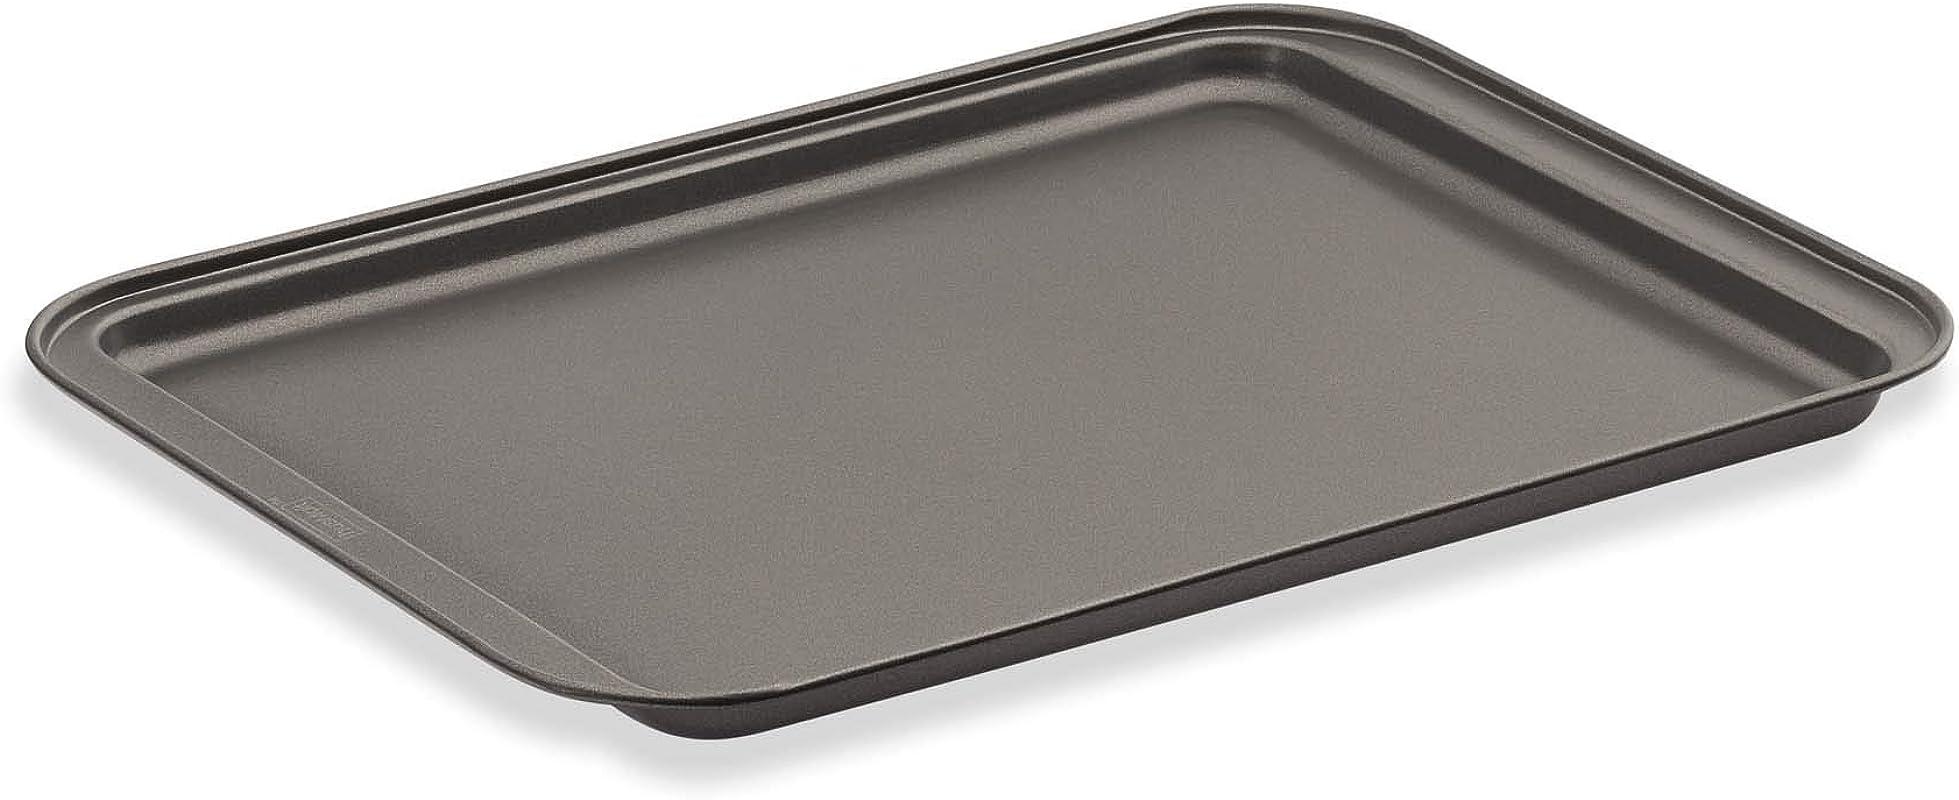 HusMait 10x14 Inch Non Stick Baking Sheet Superior Long Lasting Cookie Pan